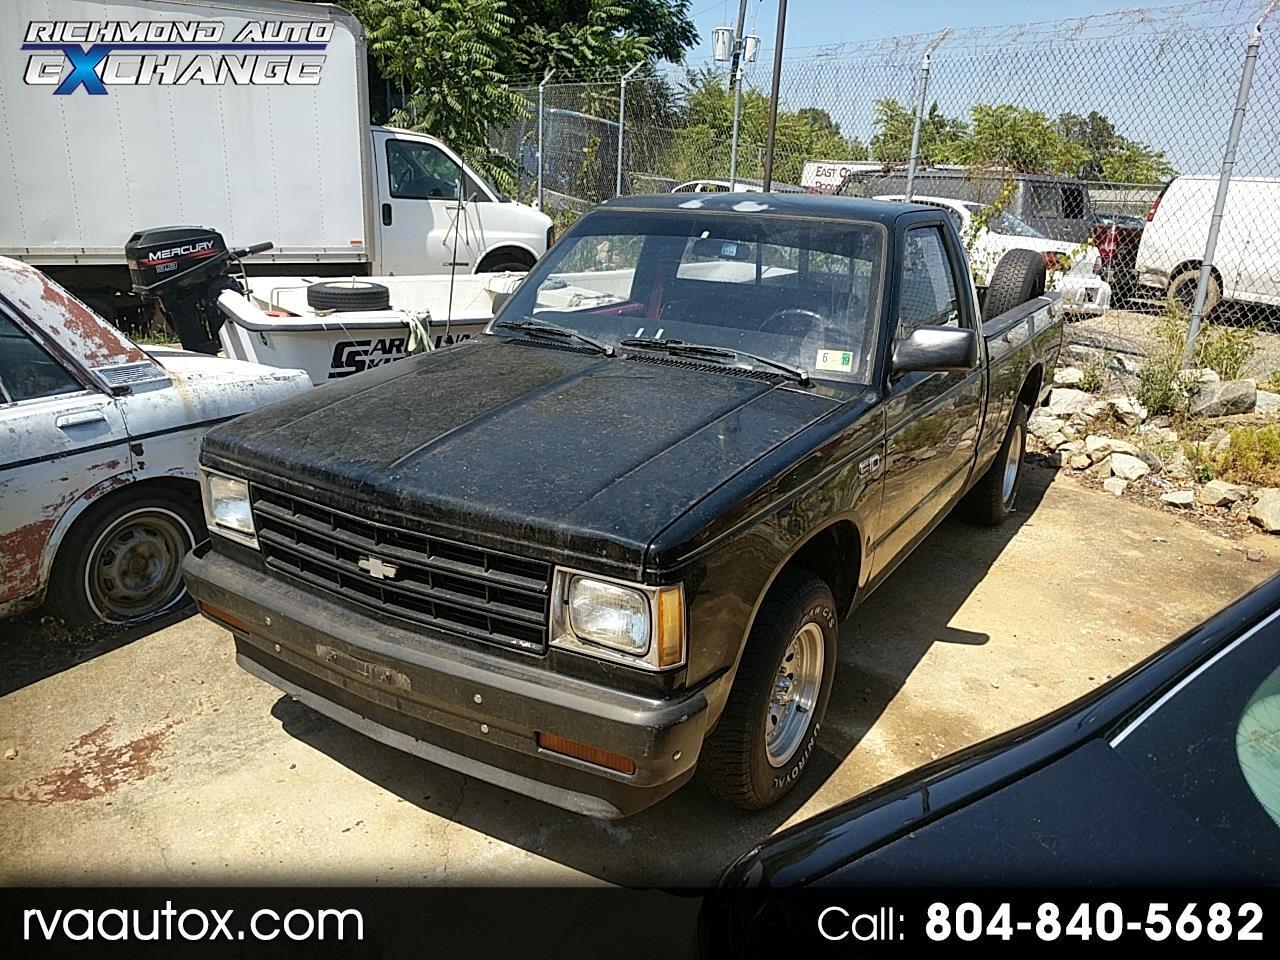 1985 Chevrolet S10 Regular Cab 2WD